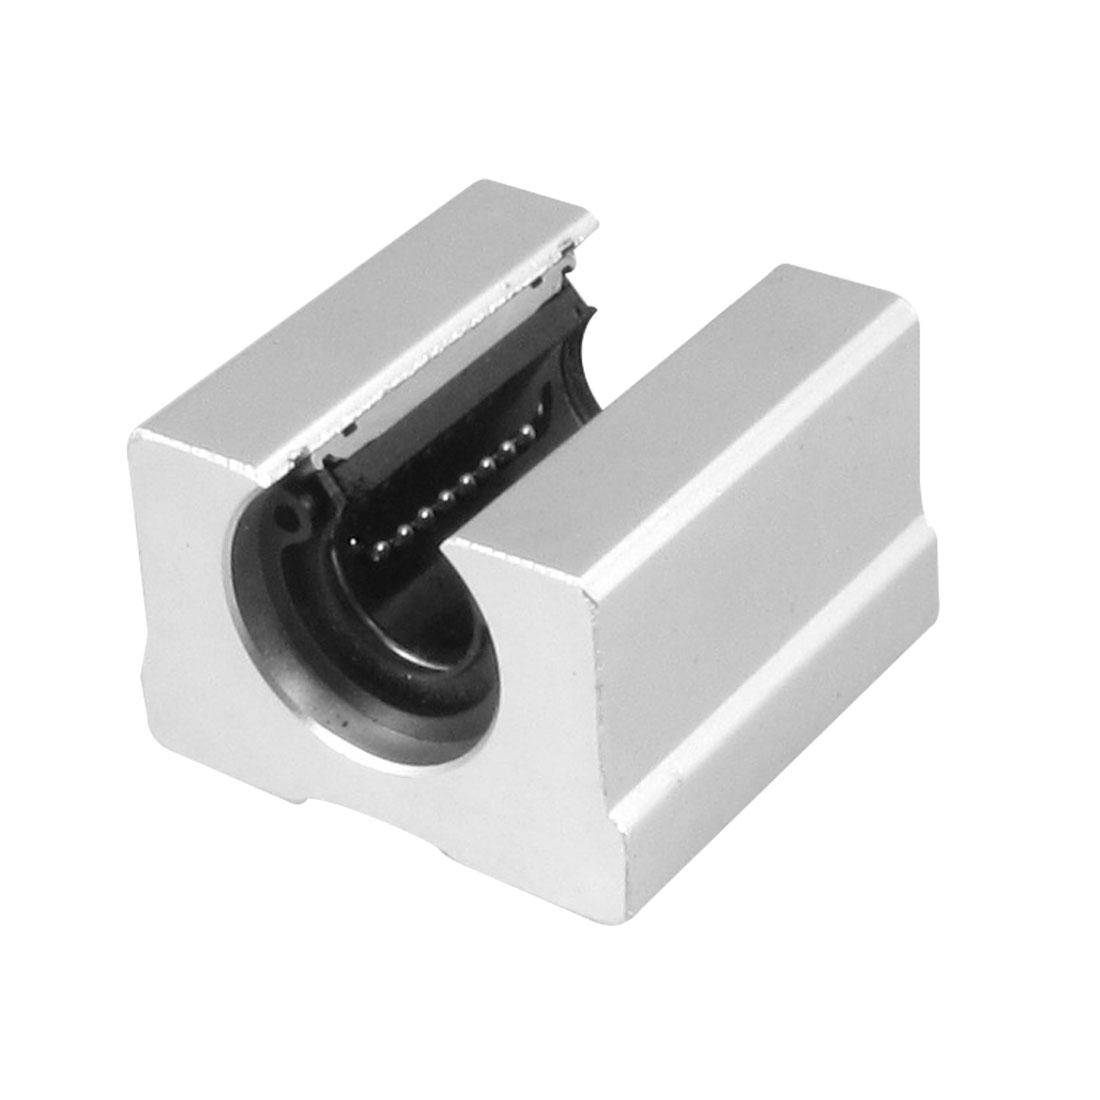 SBR12UU 12mm Linear Motion Ball Bearing Pillow Block